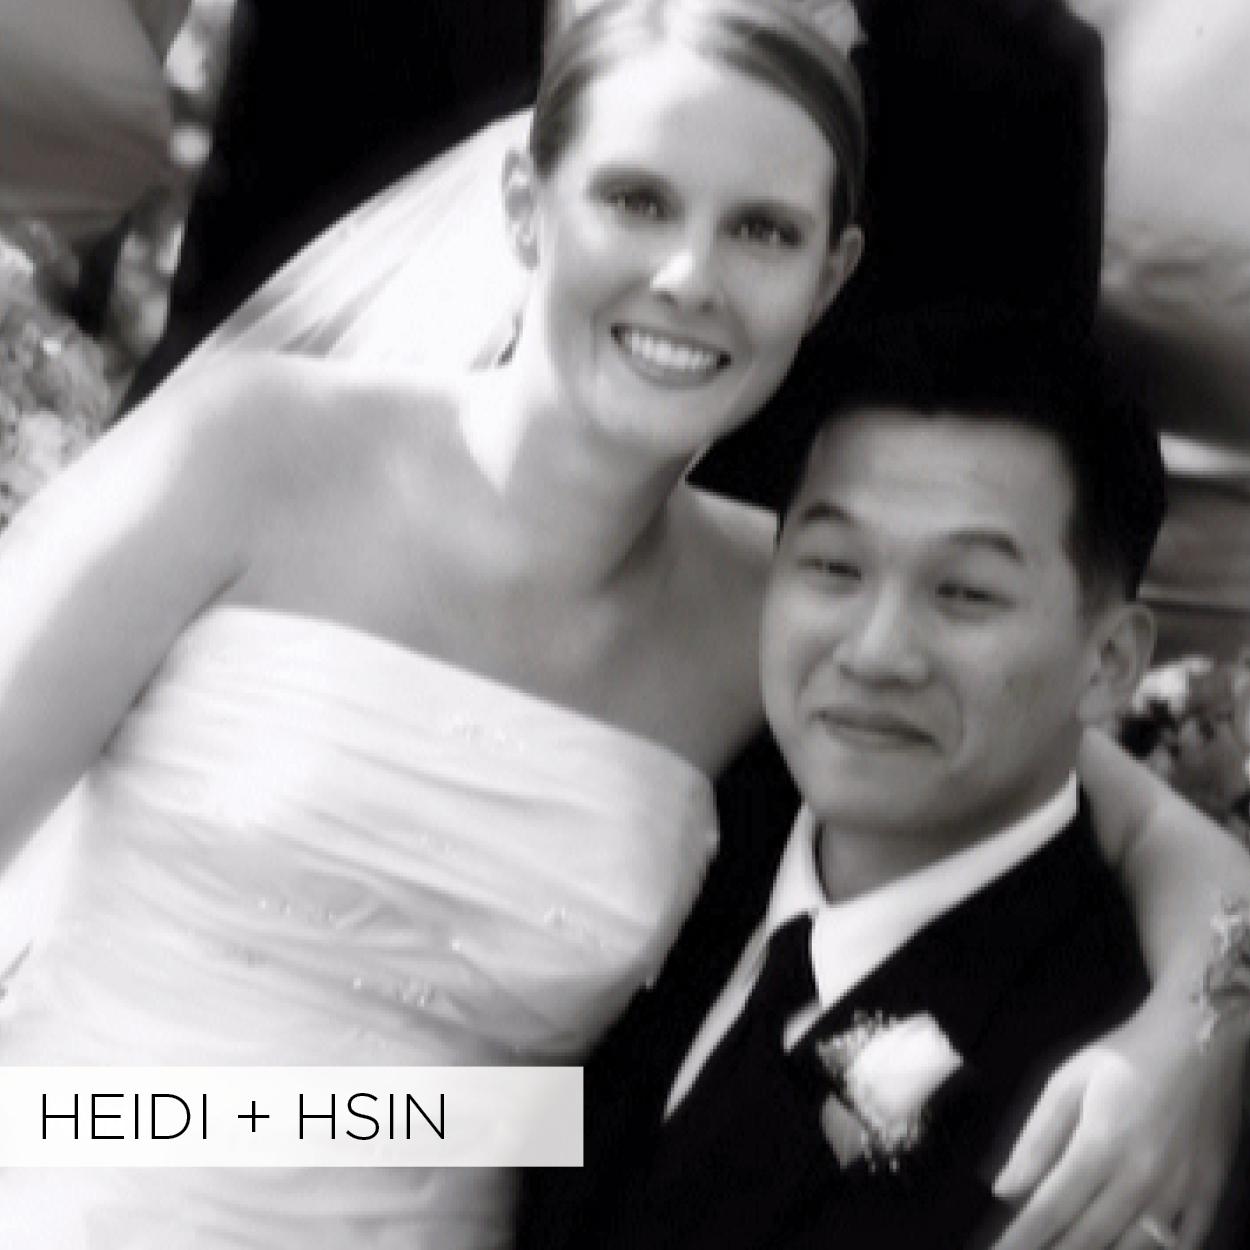 Heidi-Hsin.jpg